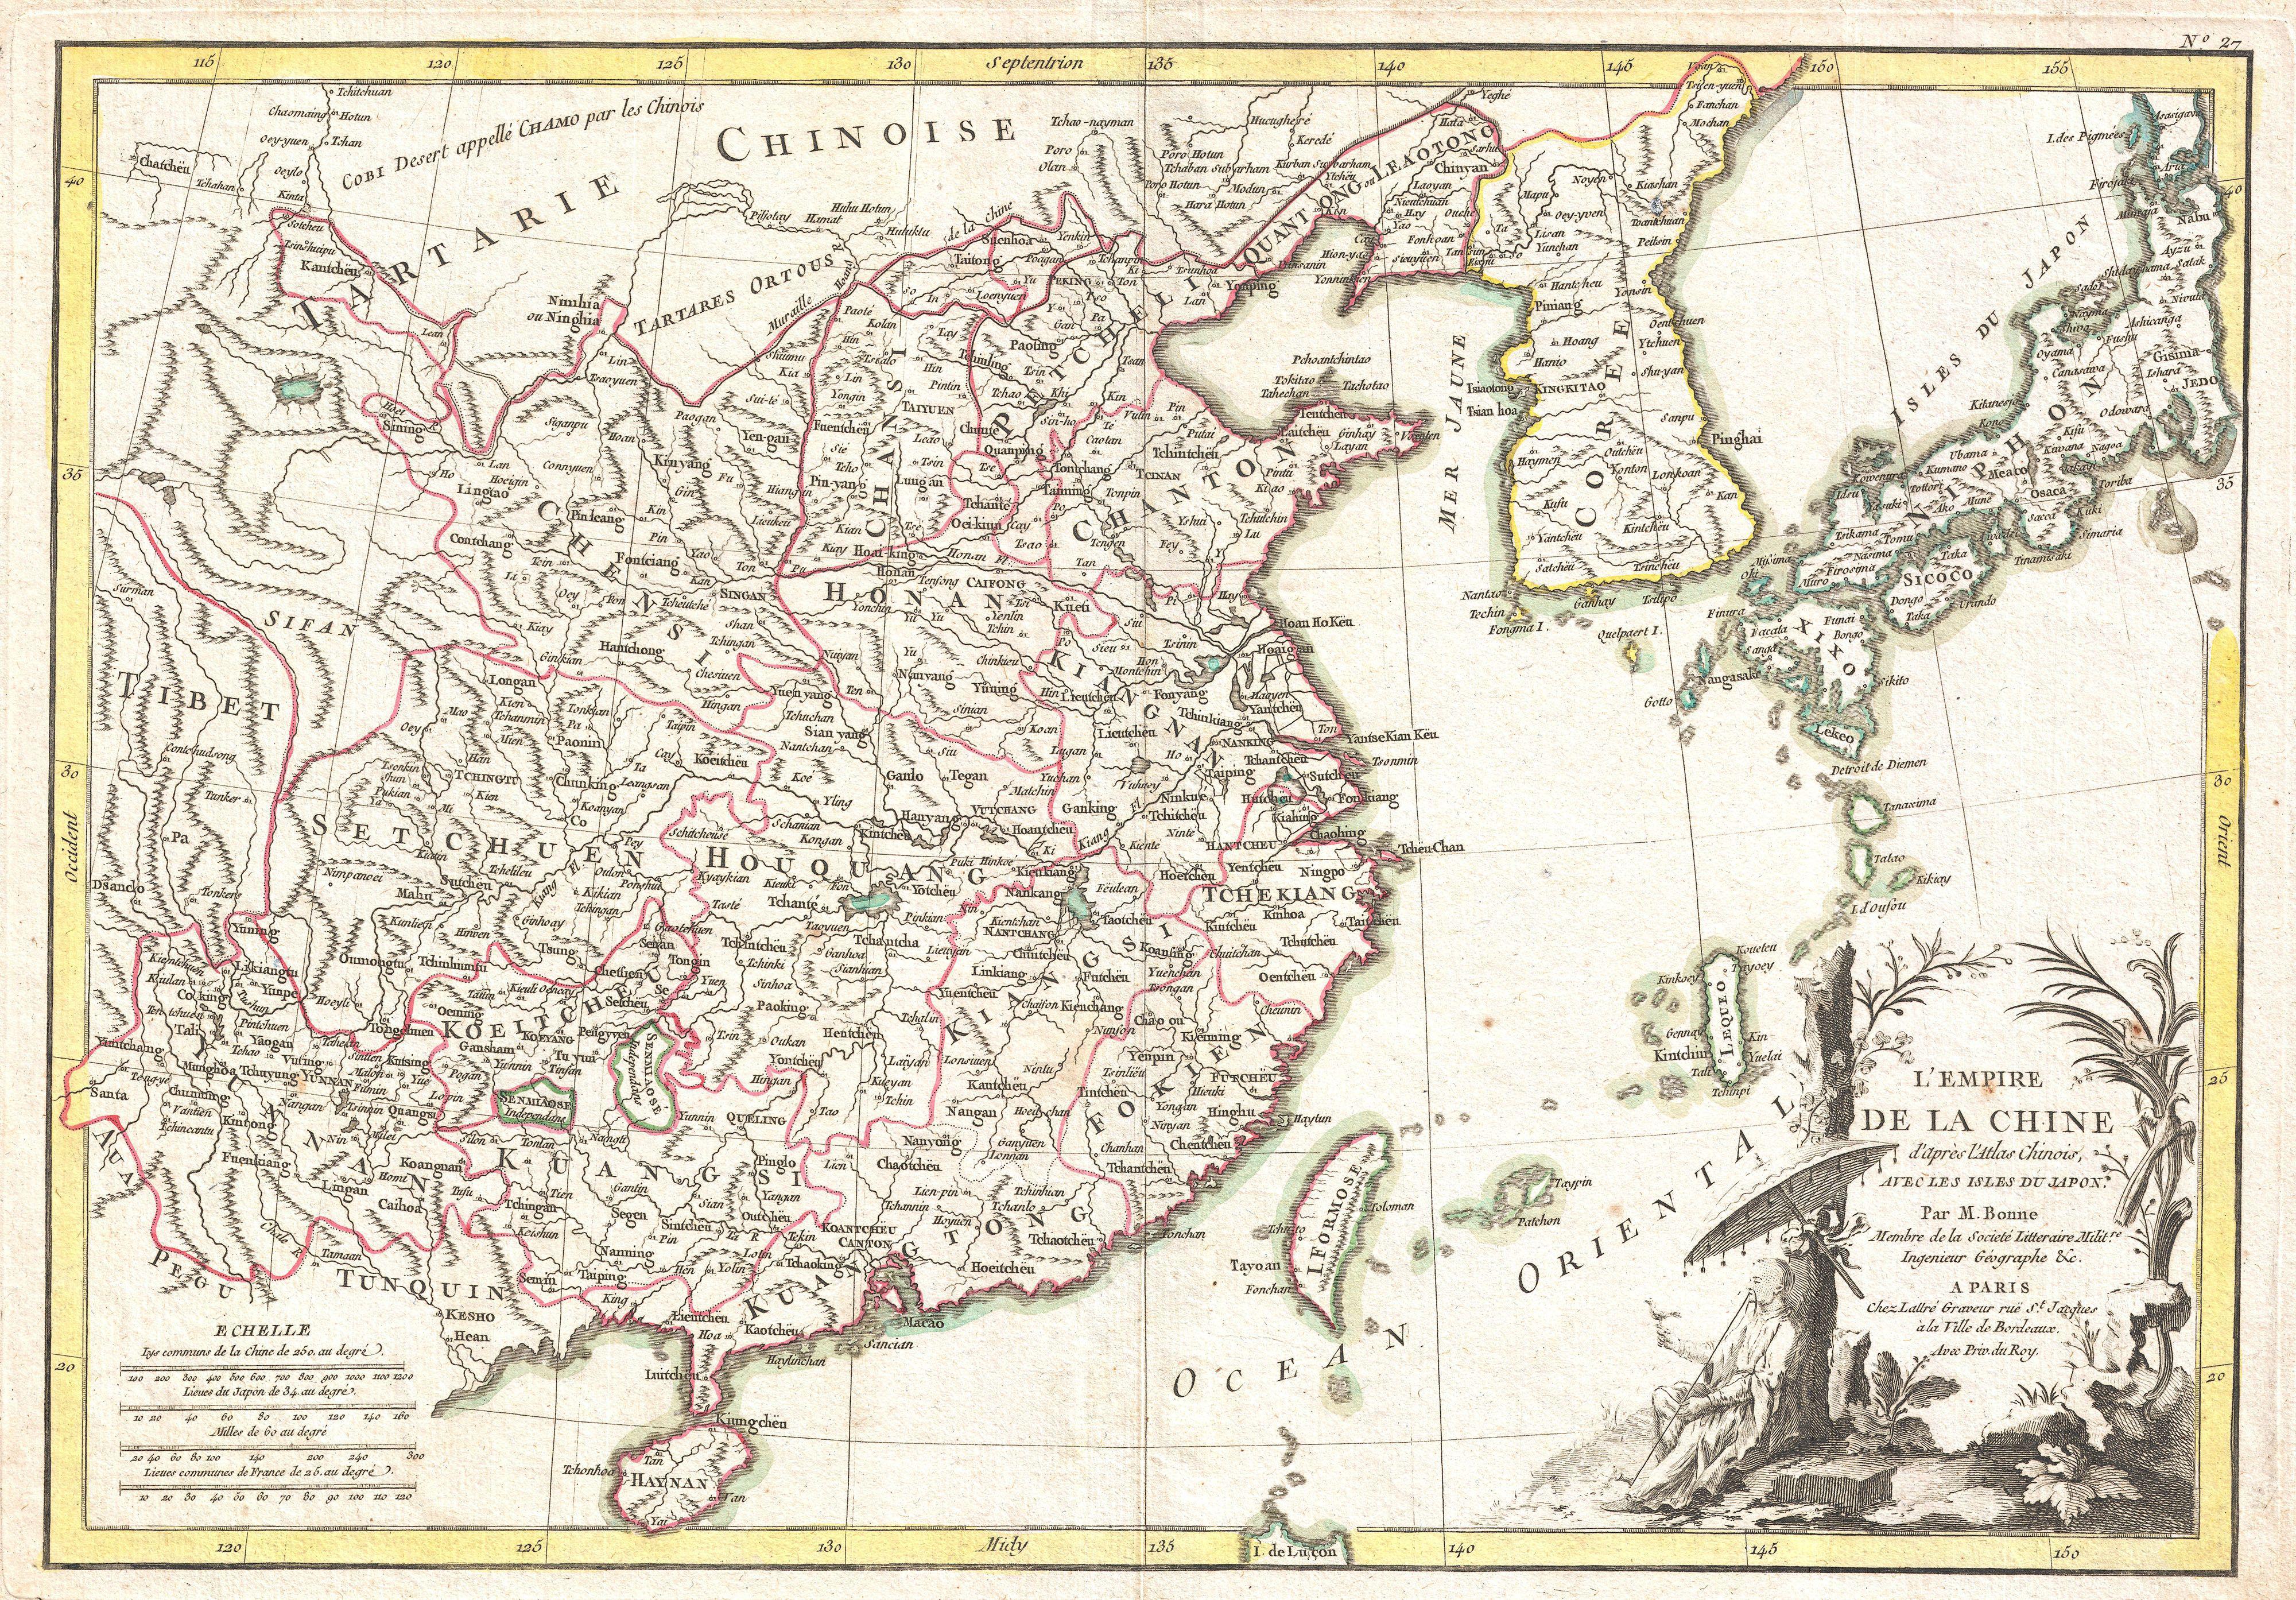 Taiwan map world atlas kalentri 2018 file1770 bonne map of china korea japan and formosa geographicus chinabonne1770jpg gumiabroncs Choice Image